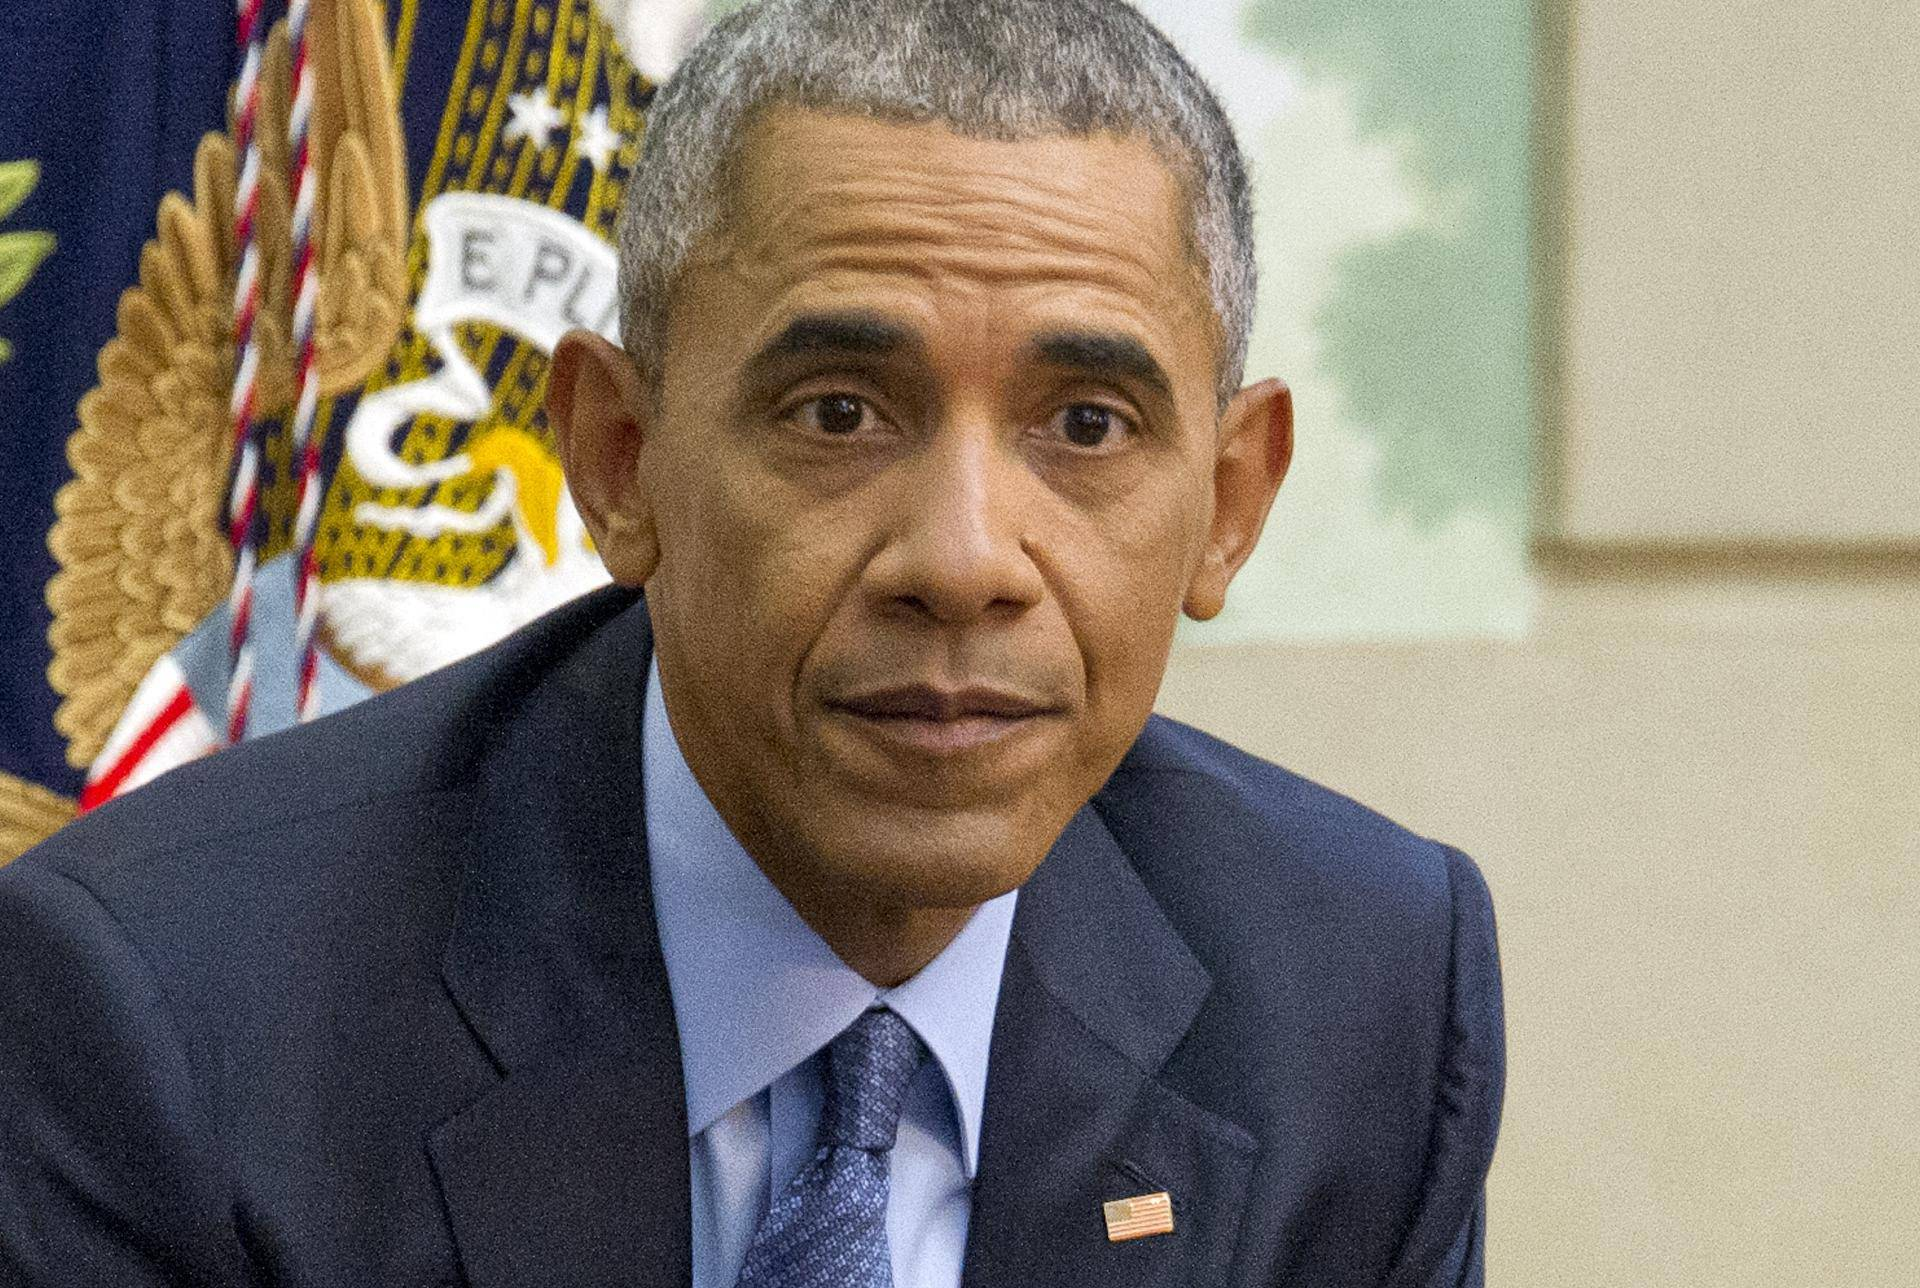 Obama Interview on Vox on ACA